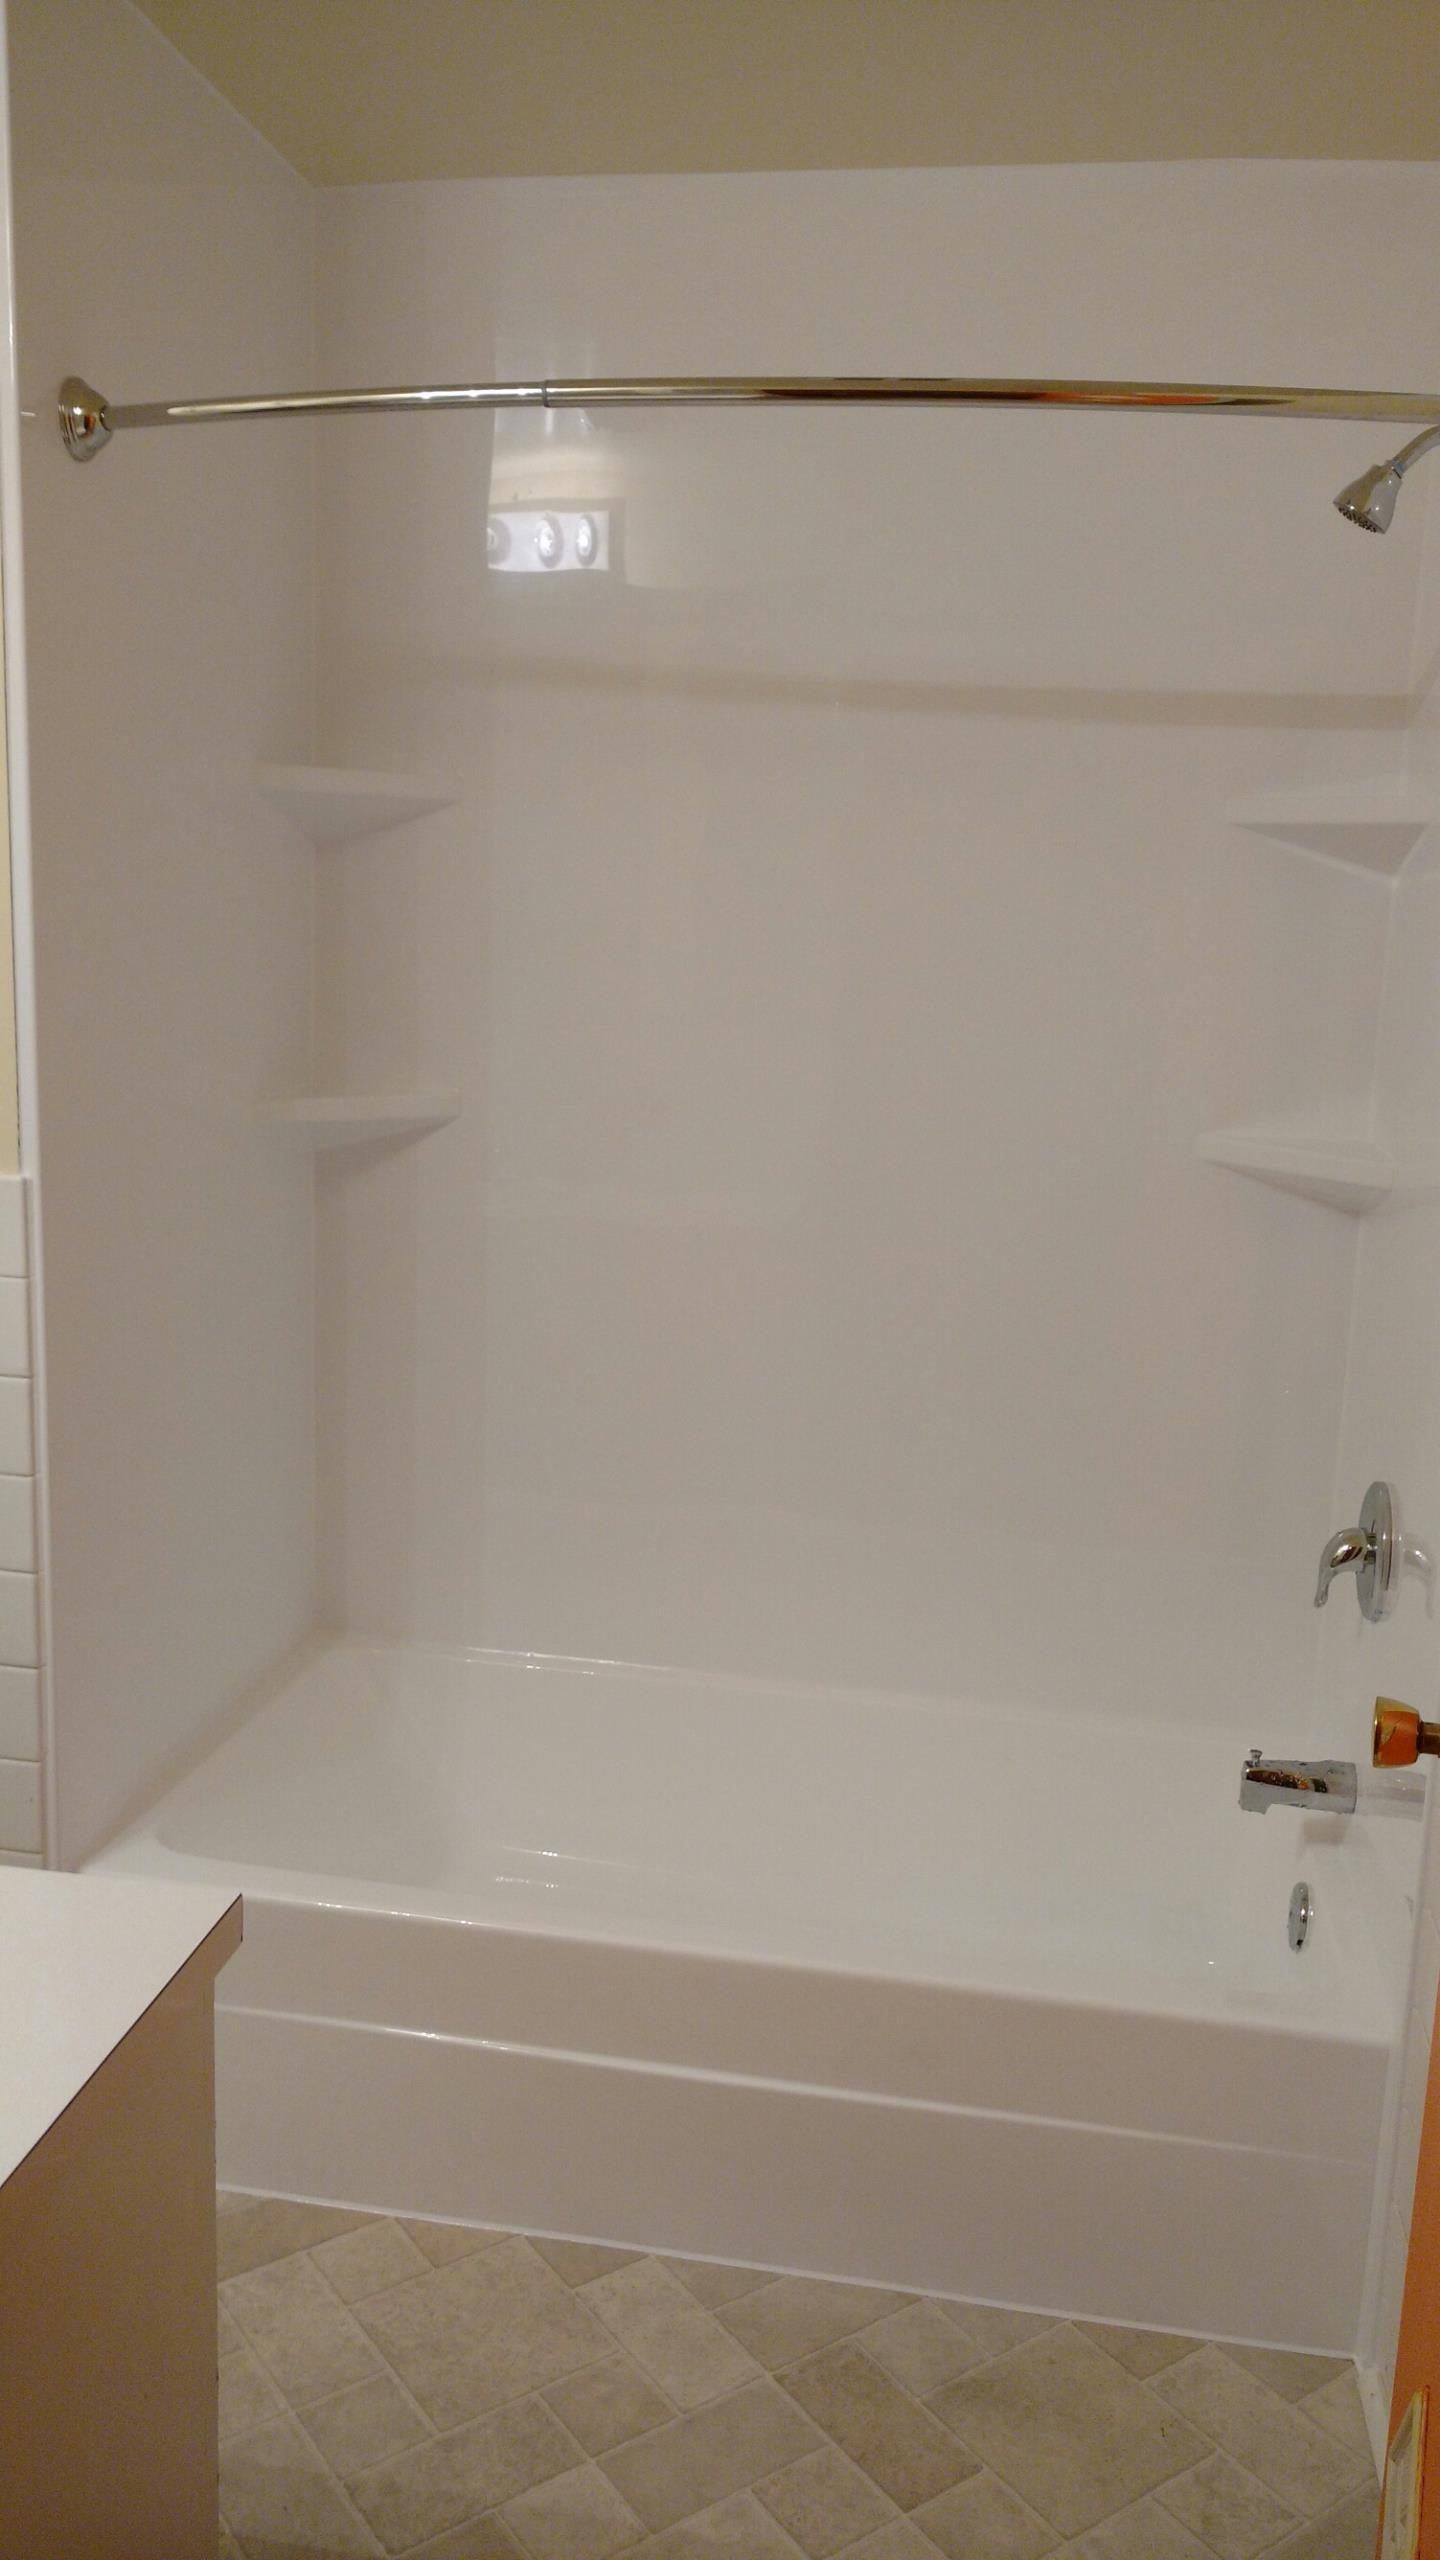 Bathroom remodeling testimonials remodeling company for Bath remodel york pa